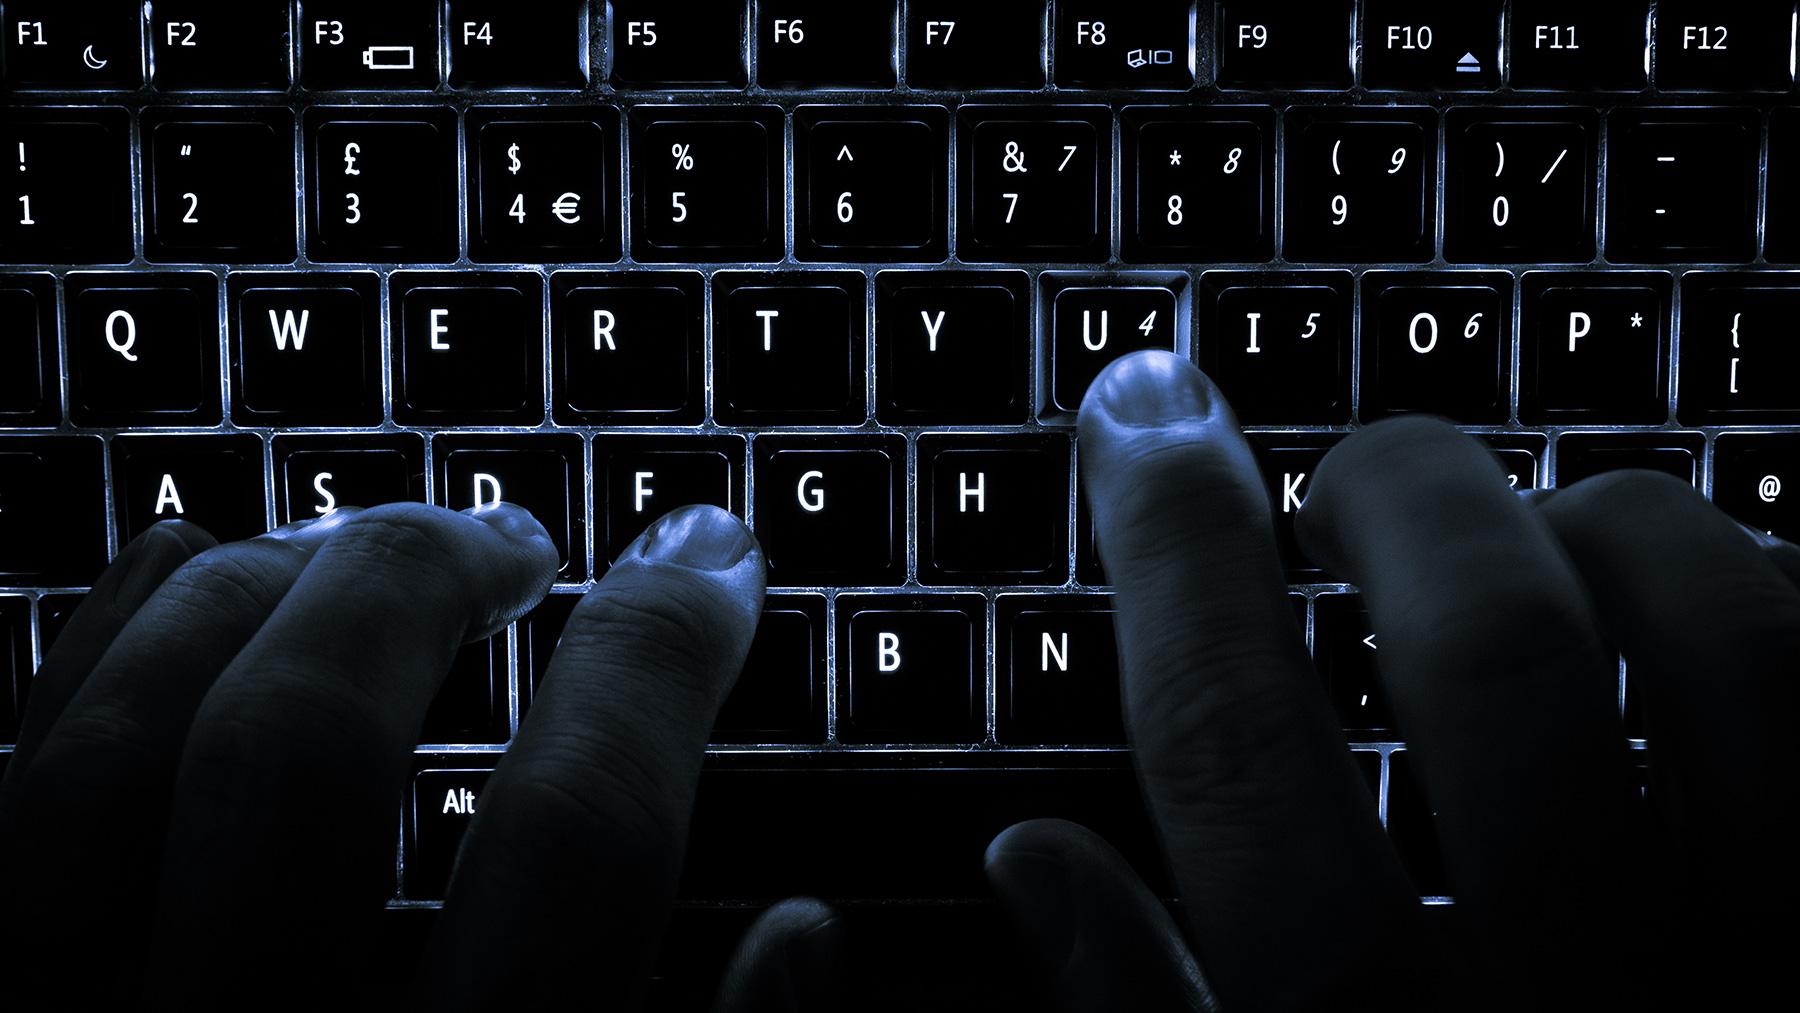 backlit keyboard photo via Wiki Commons